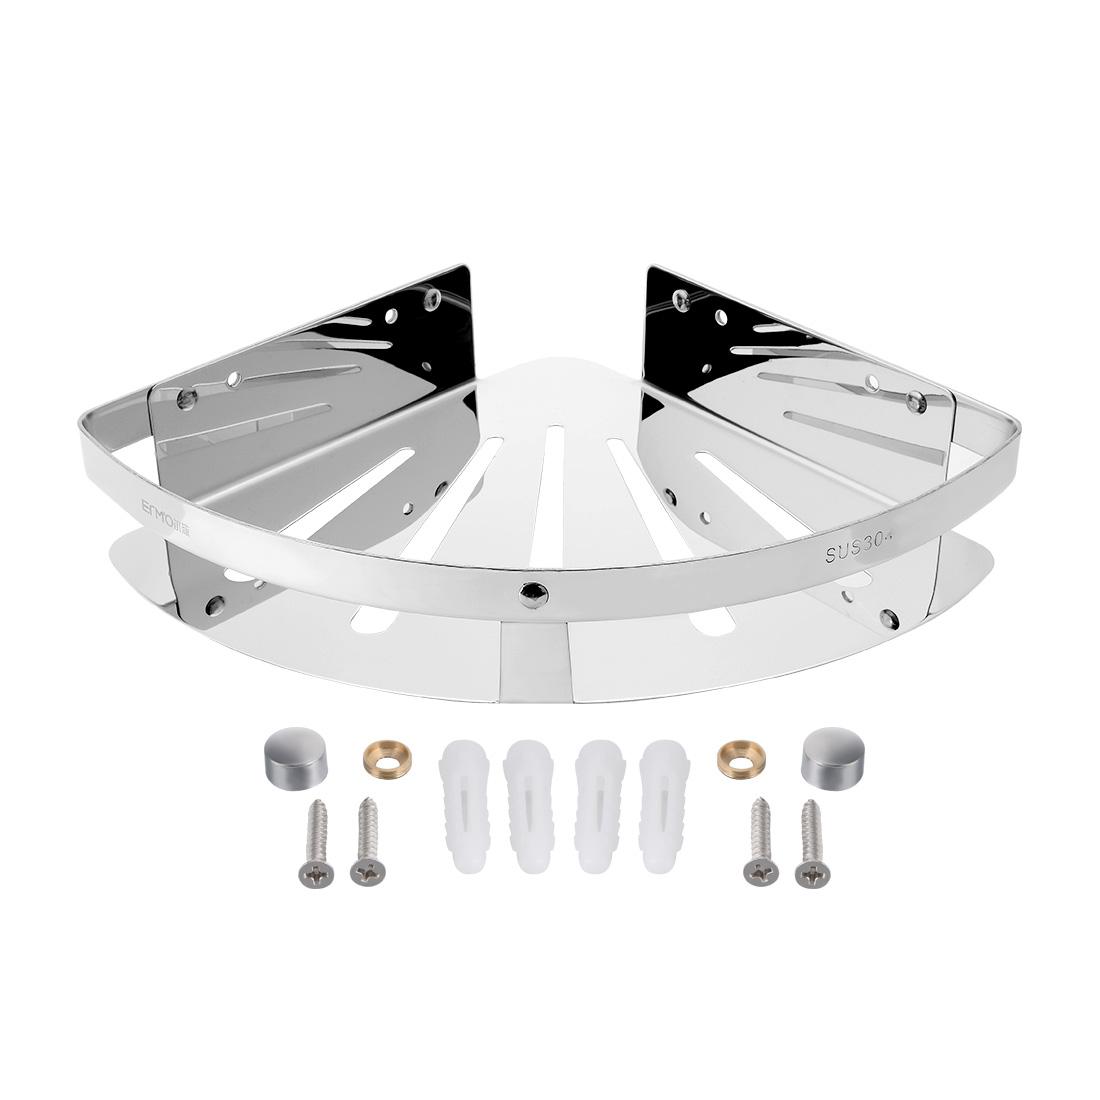 11.4-inch x 9.1-inch 304 Stainless Steel Polished Corner Bathroom Shower Basket